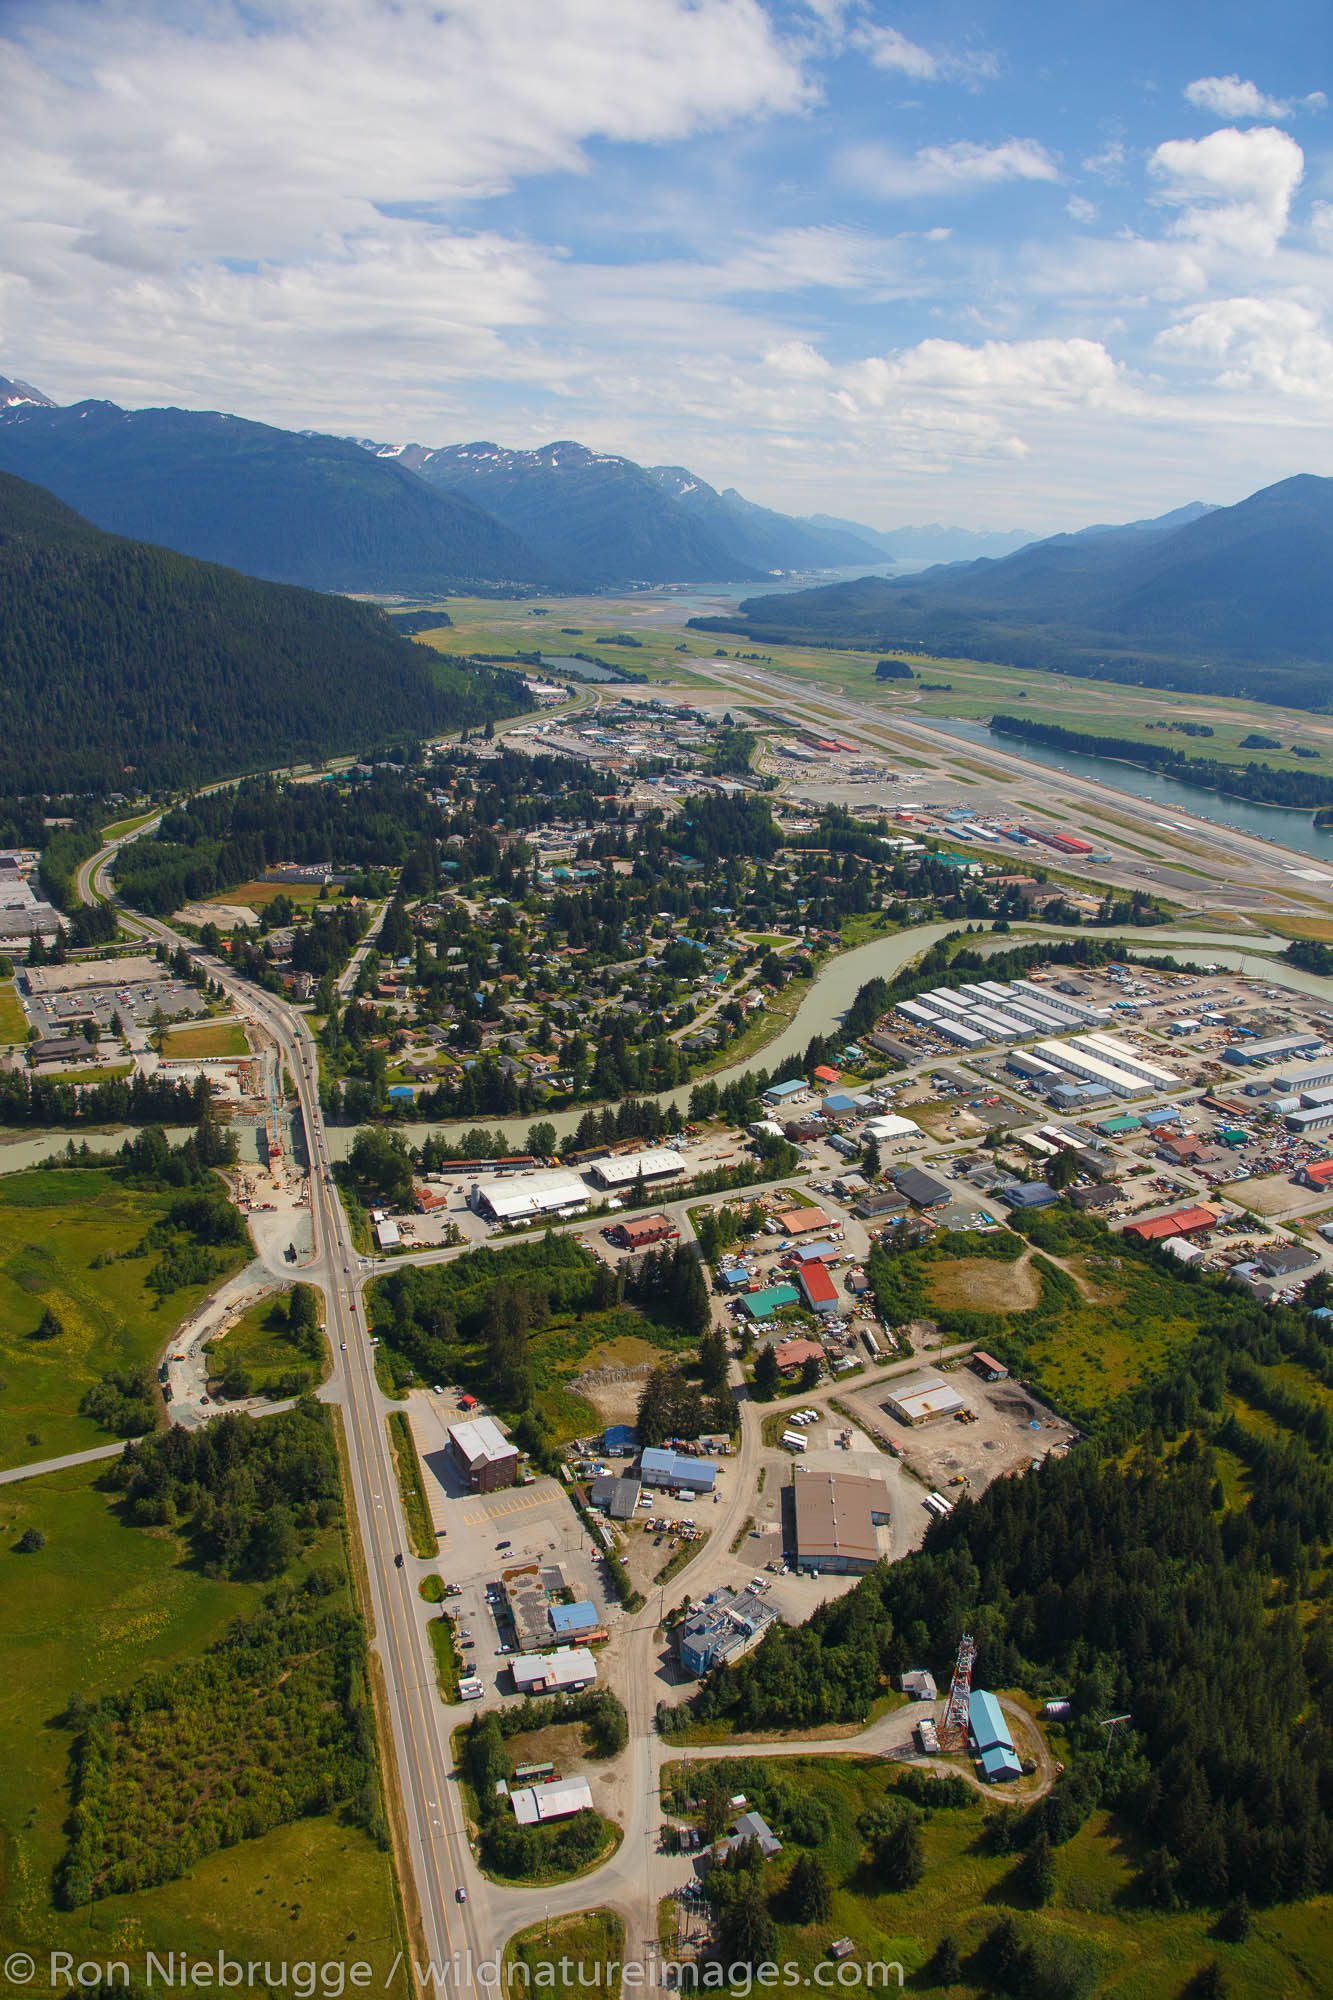 Aerial view of Mendenhall Valley, Juneau, Alaska.